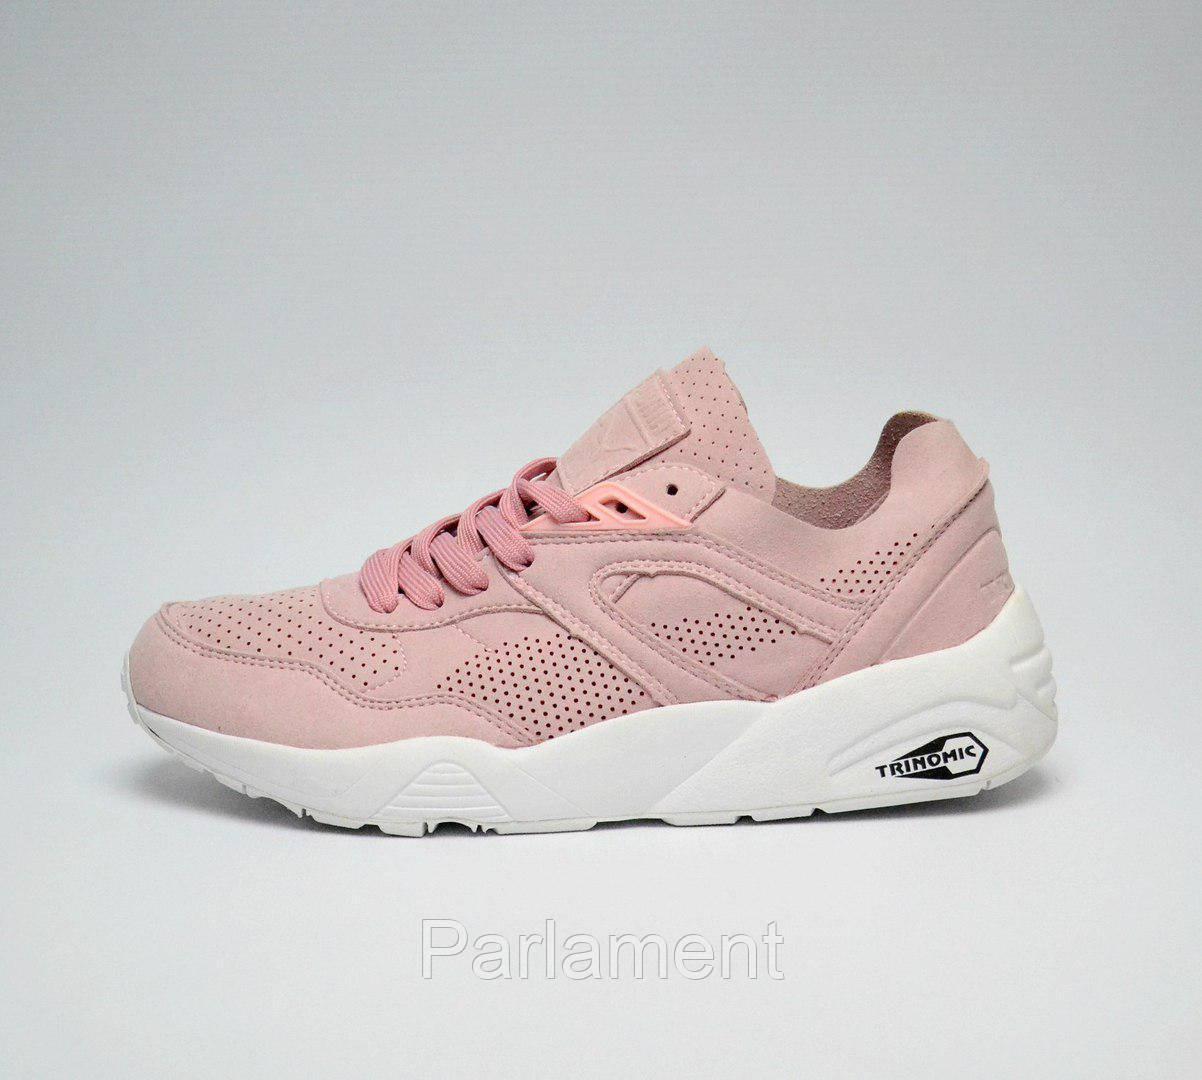 76a83b1364dd Женские Кроссовки Puma Trinomic Soft Pink (Реплика) — в Категории ...